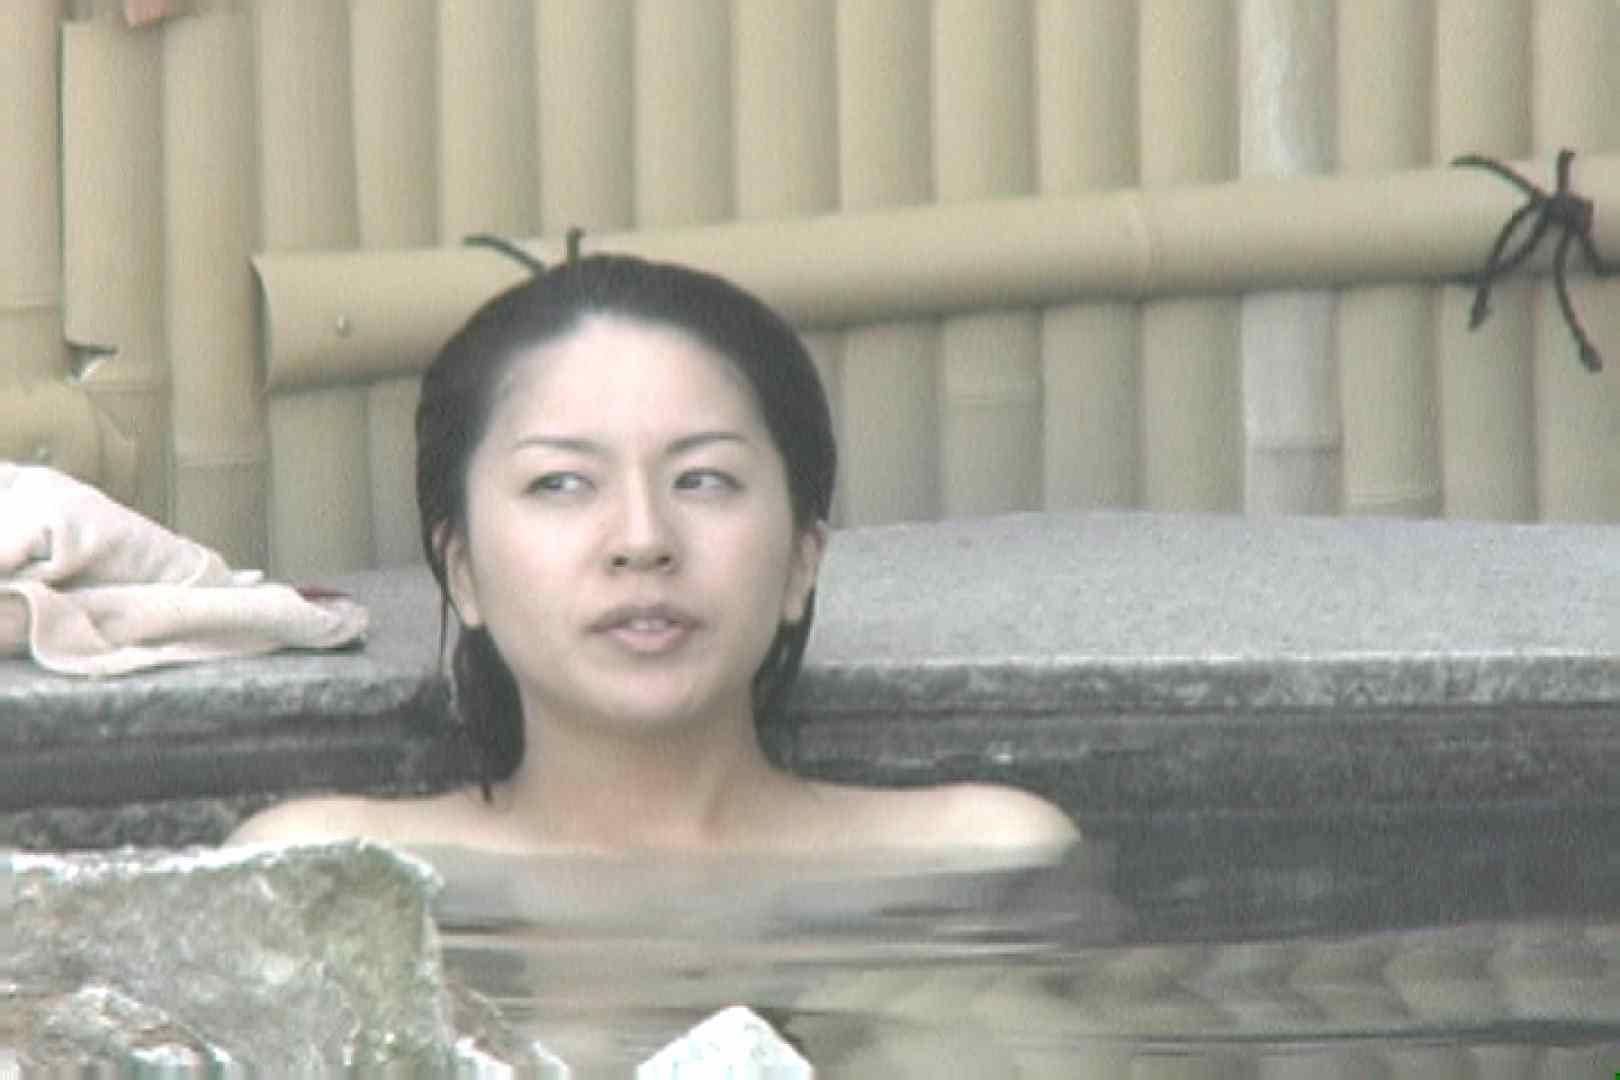 Aquaな露天風呂Vol.694 露天 | OLセックス  67画像 19